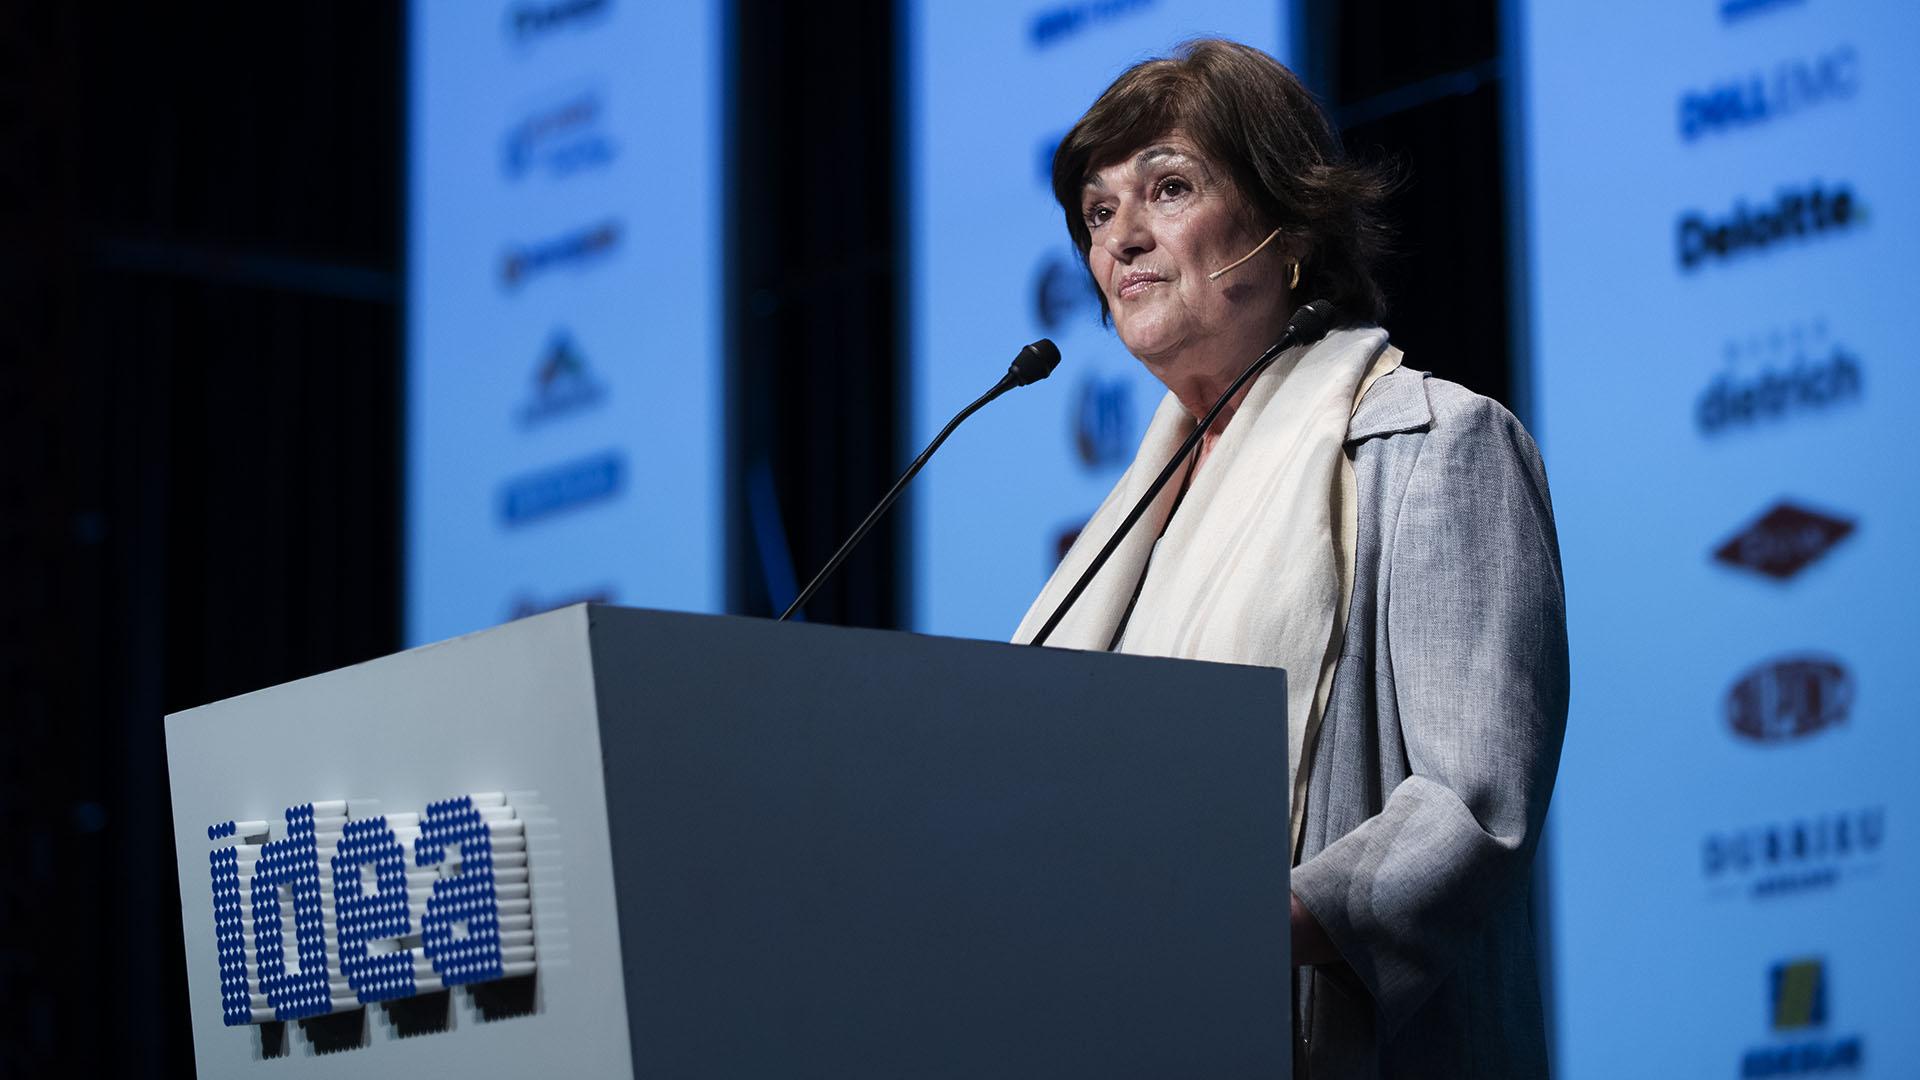 María Angélica Gelli, Abogada Constitucionalista